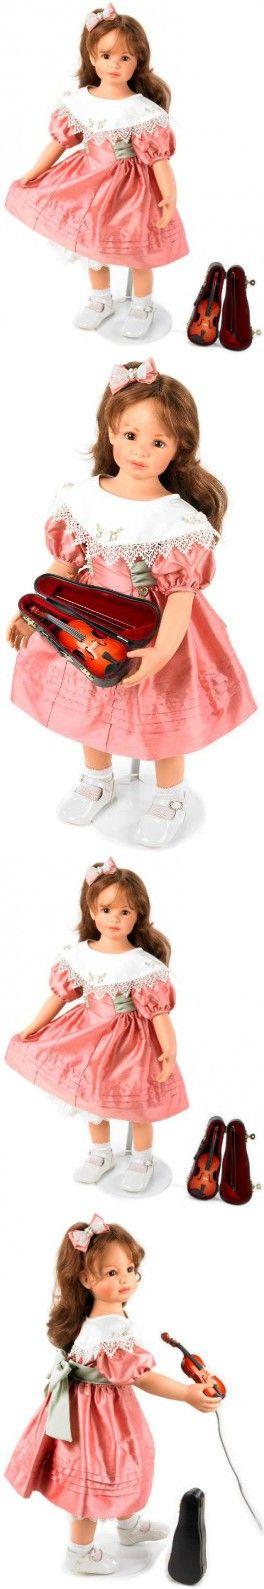 Zapf Creation Fondest Memories Catherine First Recital Doll